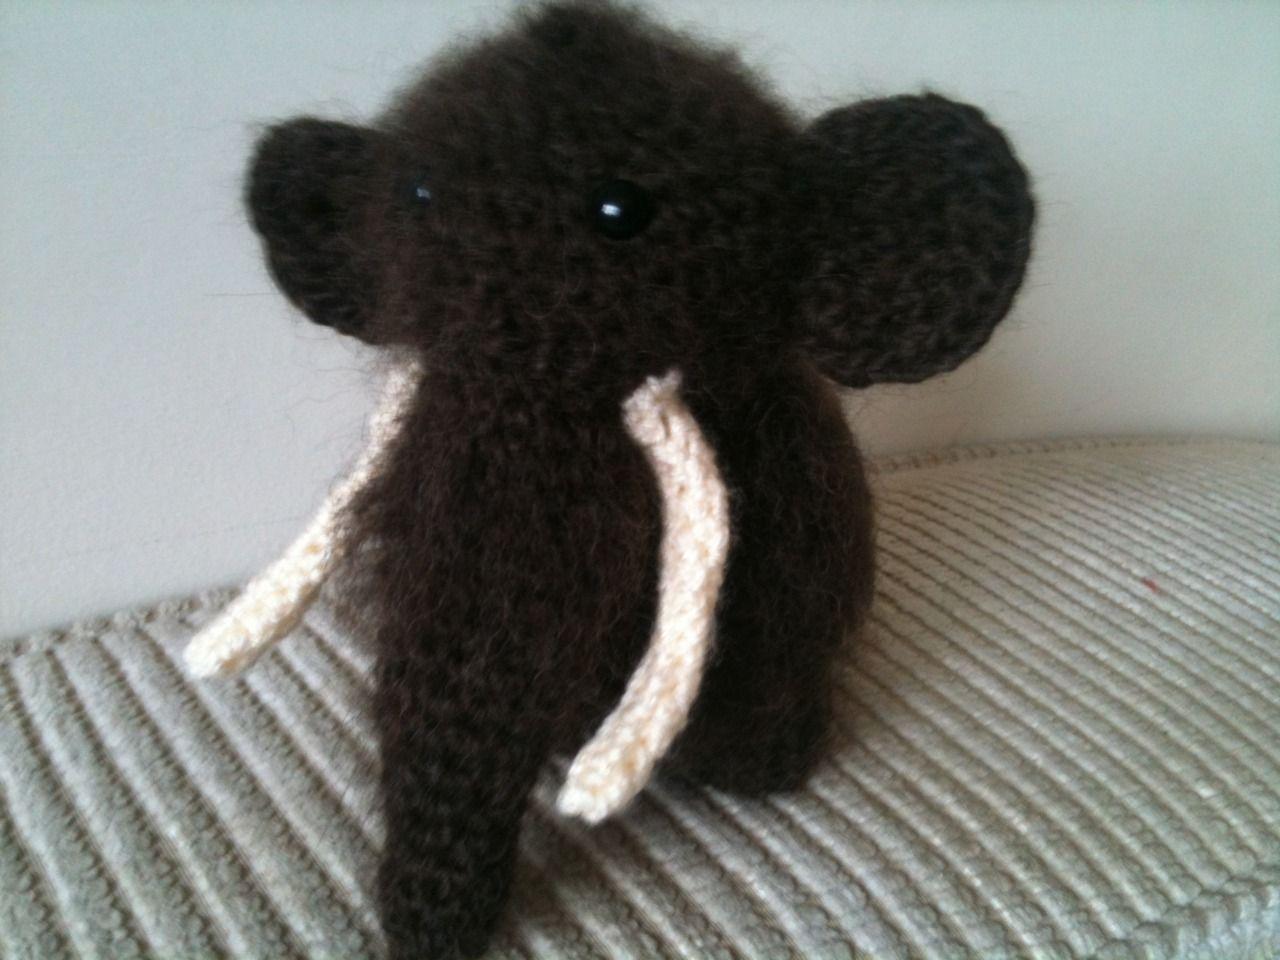 Alpaca Amigurumi Pattern Free : Wooly mammoth free crochet pattern http: justaddawesome.tumblr